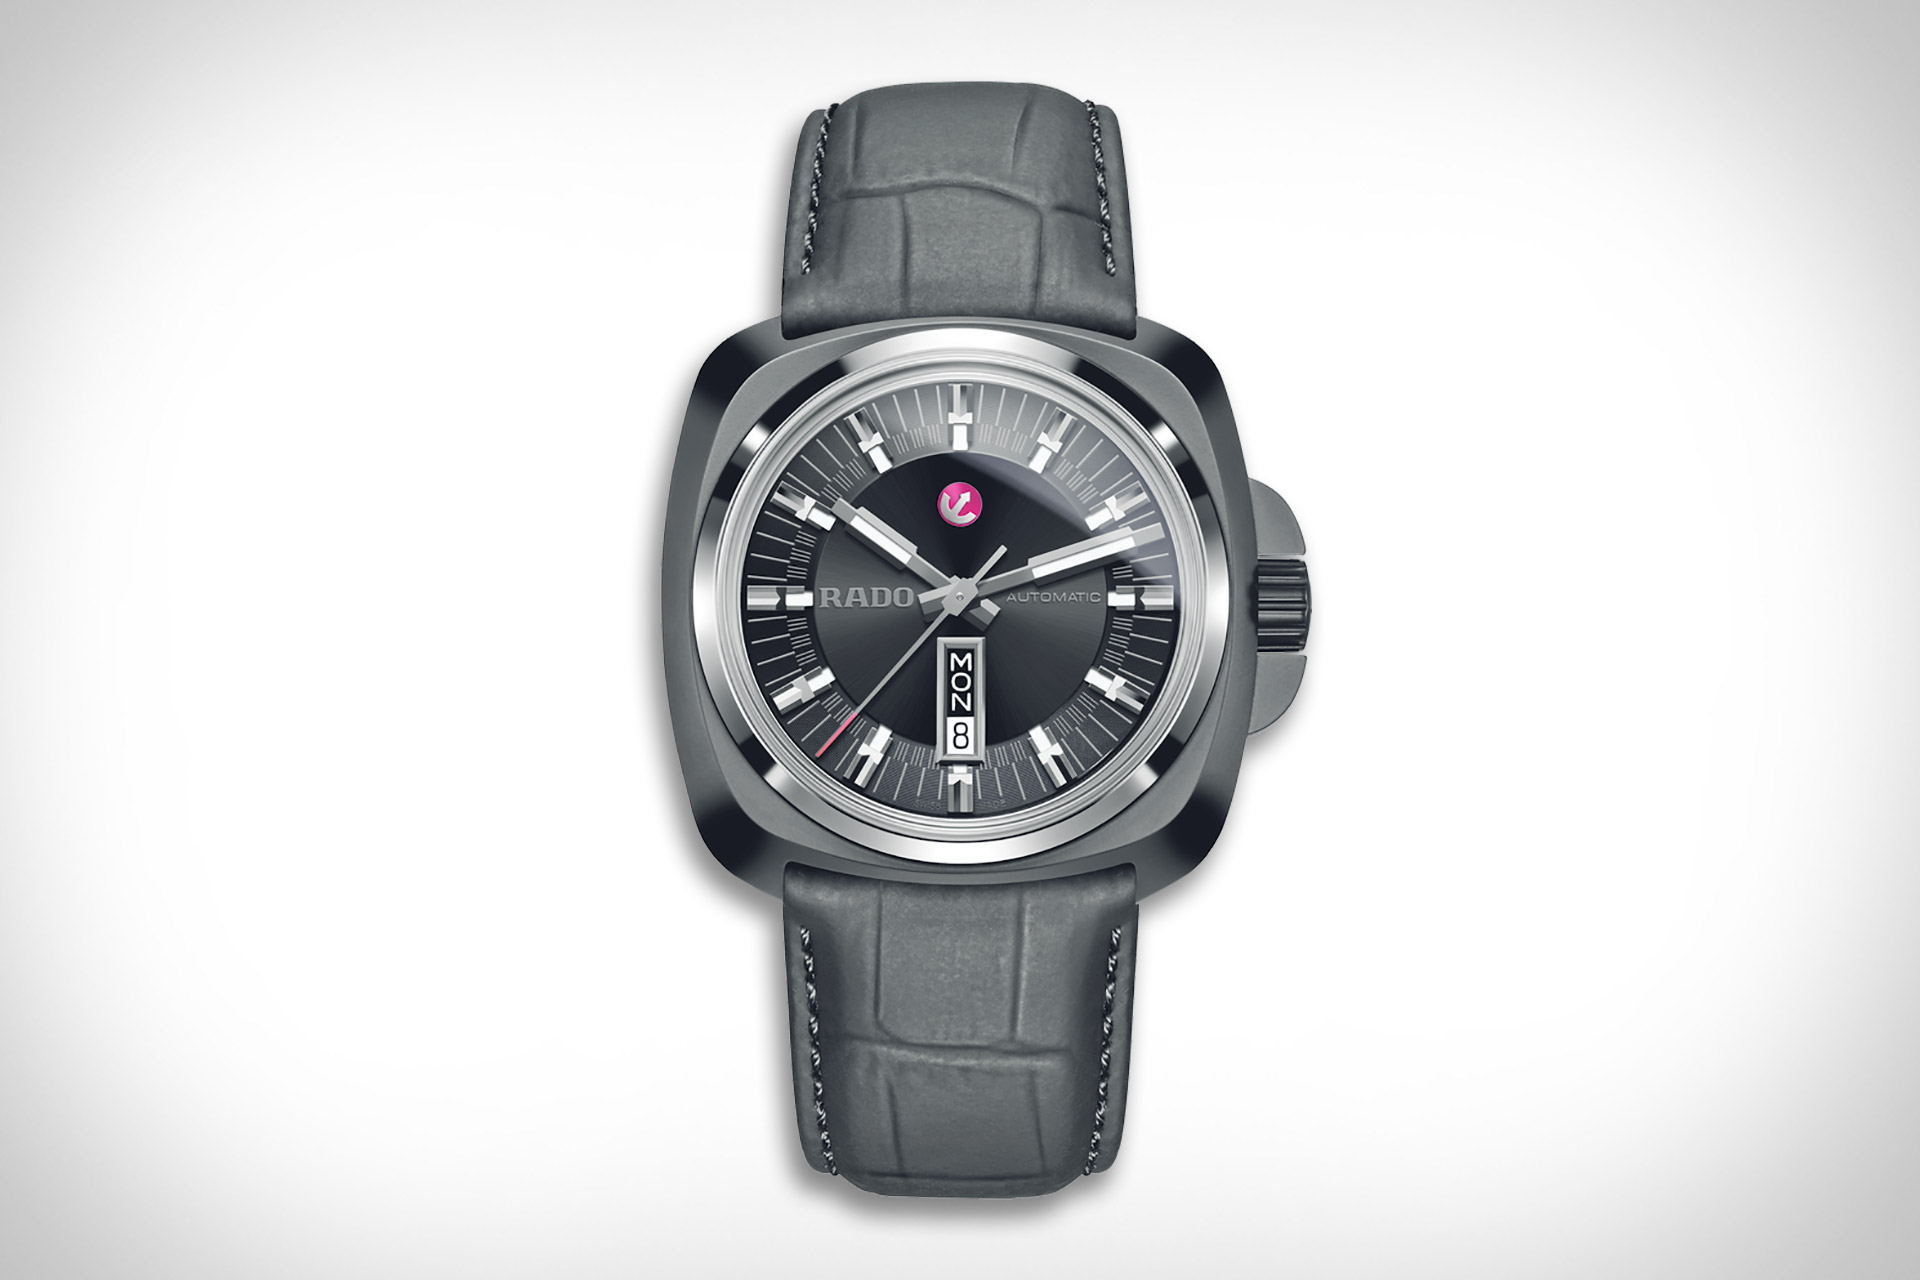 Rado HyperChrome 1616 Watch